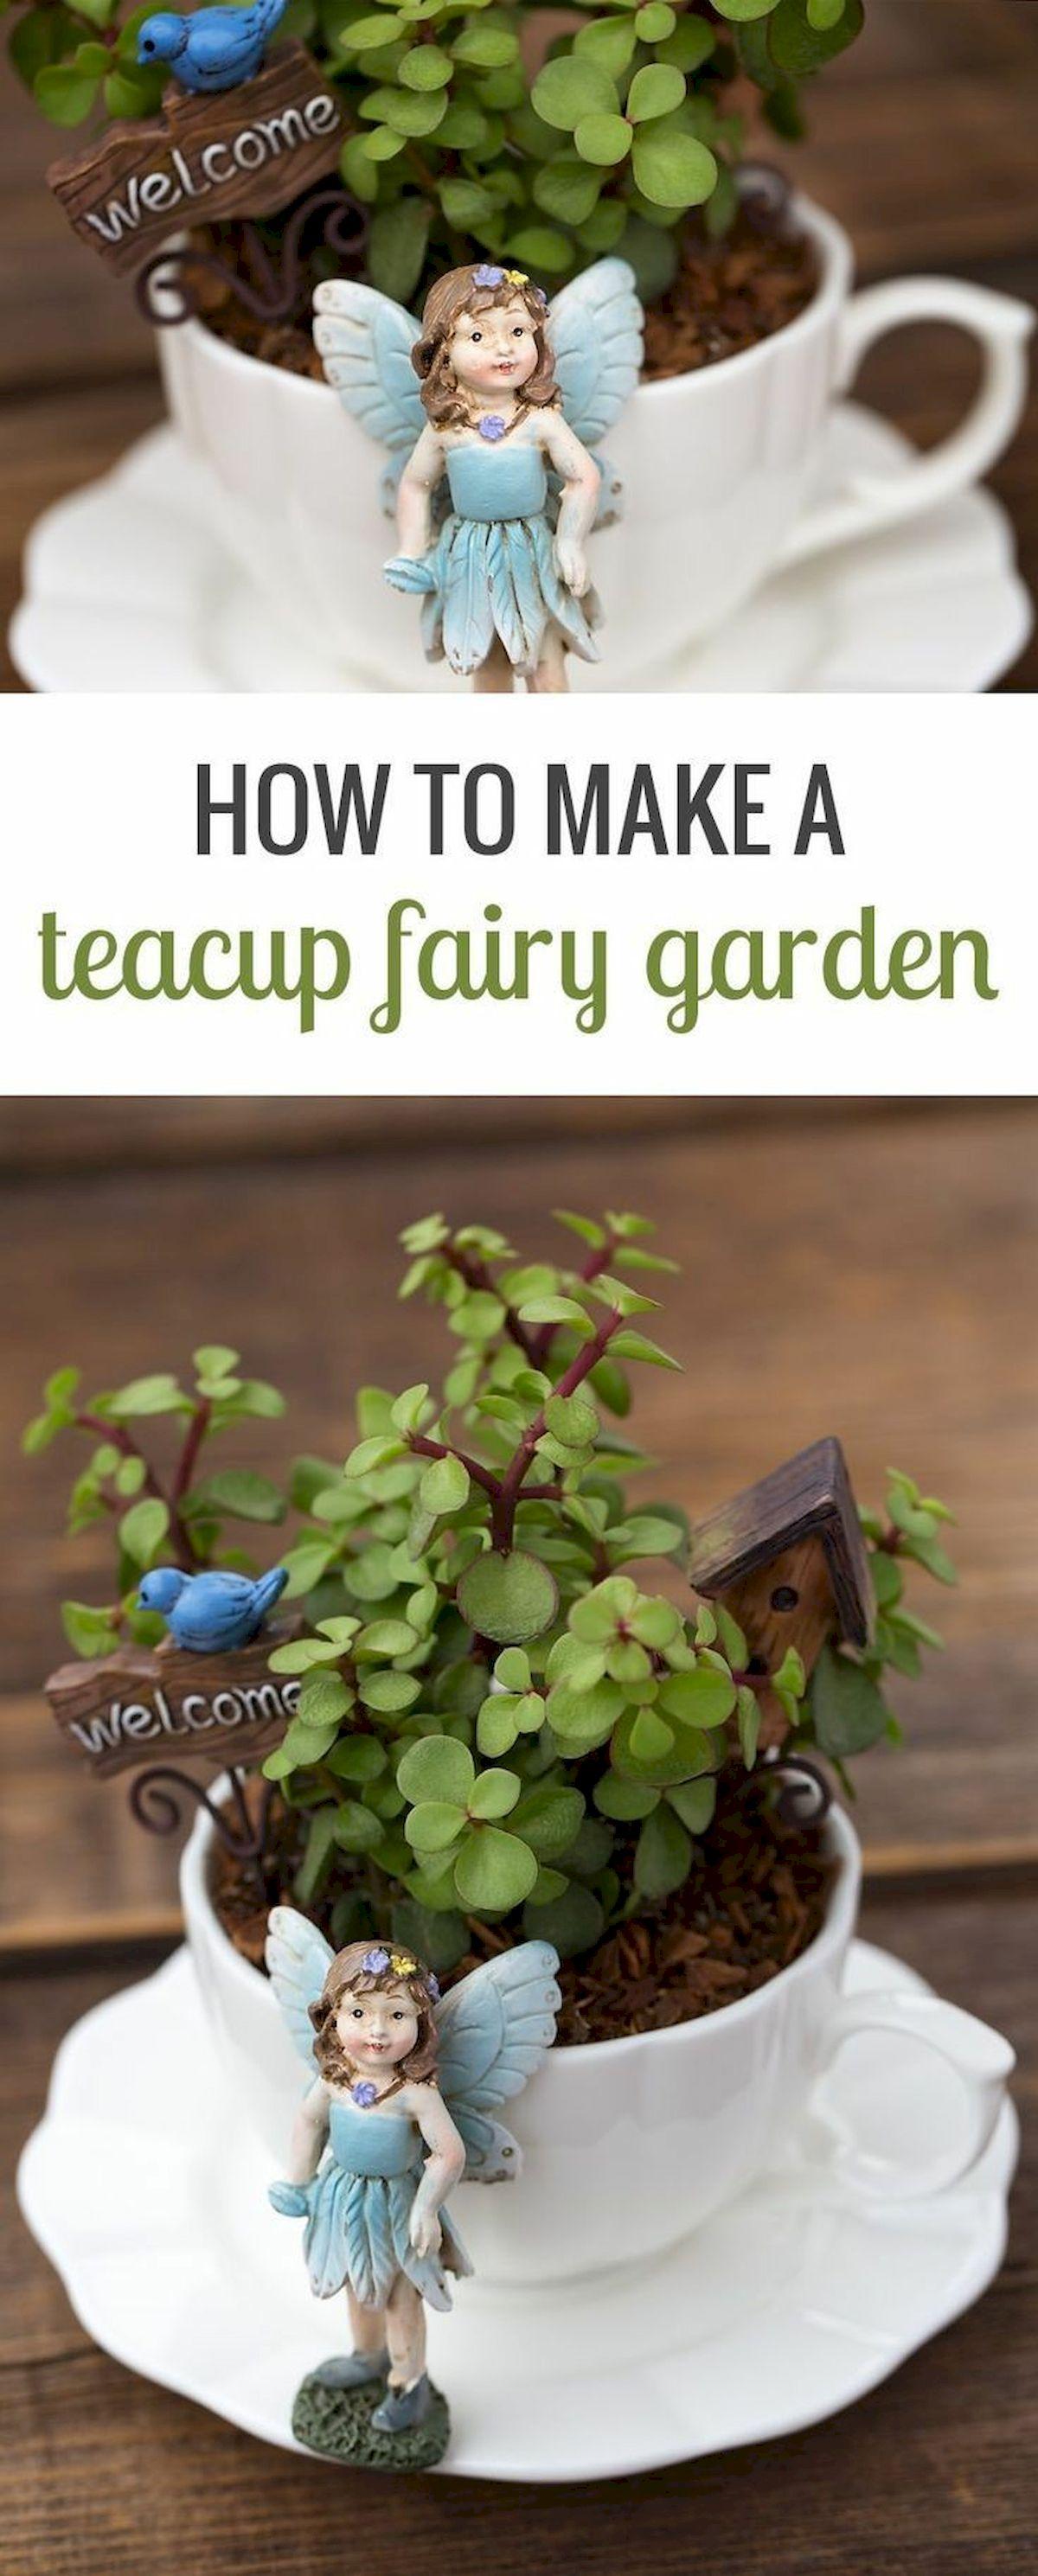 40 Beautiful Indoor Fairy Garden Ideas (21) - GARDENIDEAZ COM